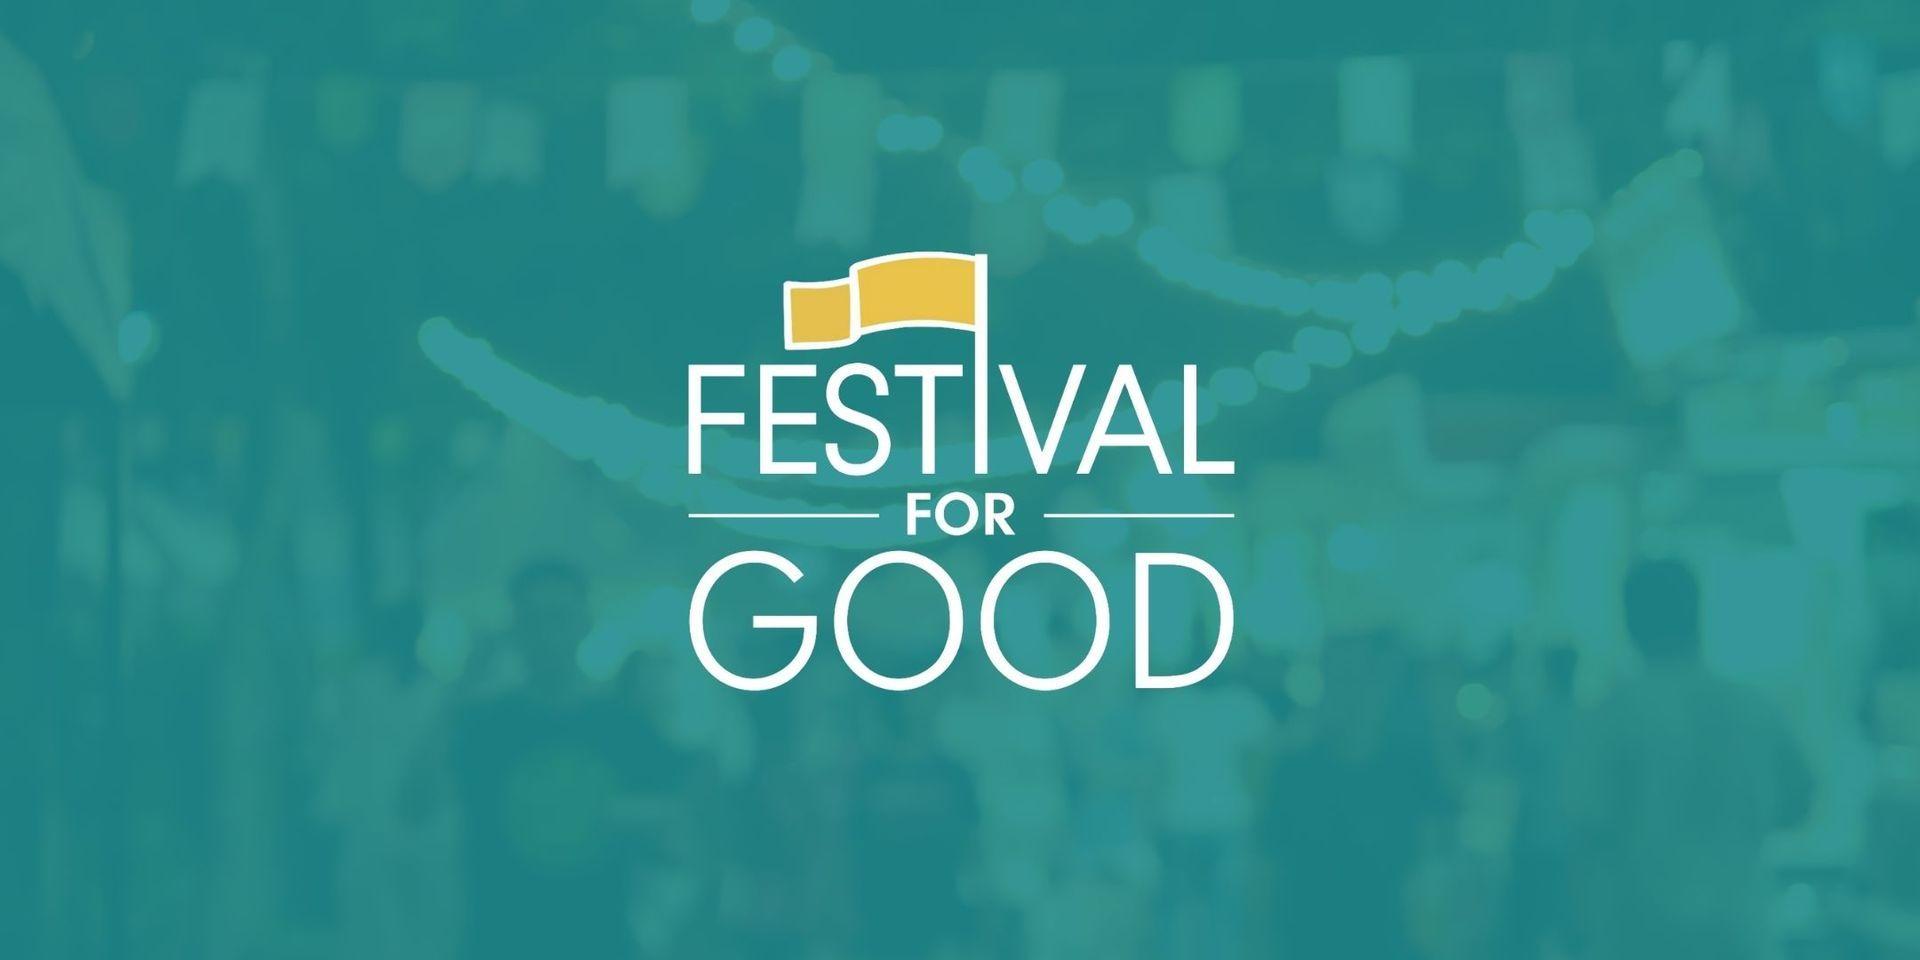 The Festival for Good